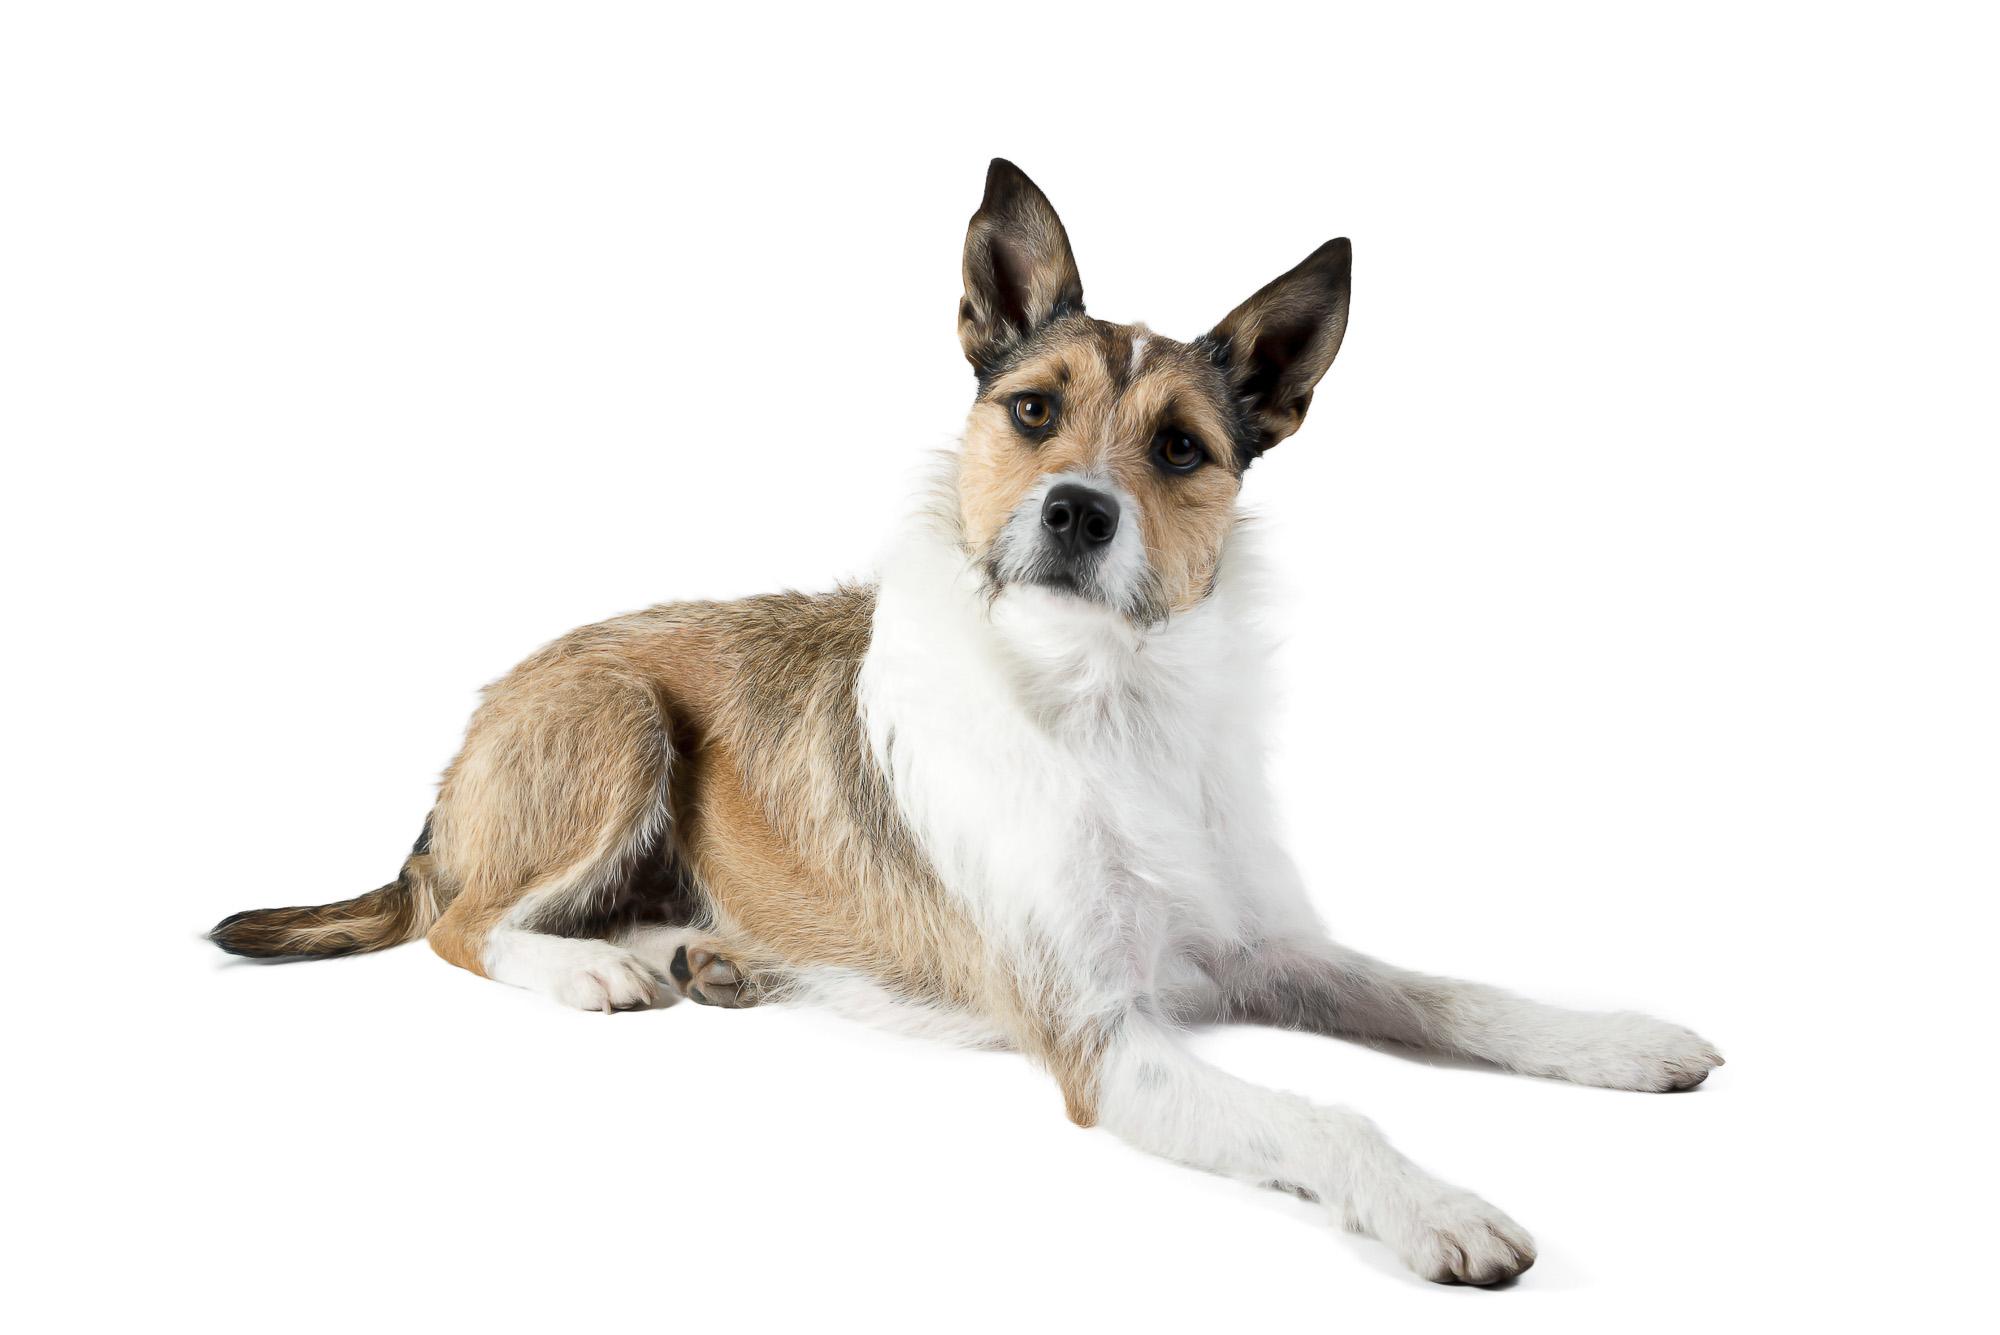 LupinBay-Dog-Pet-Photography-2277-Edit.jpg